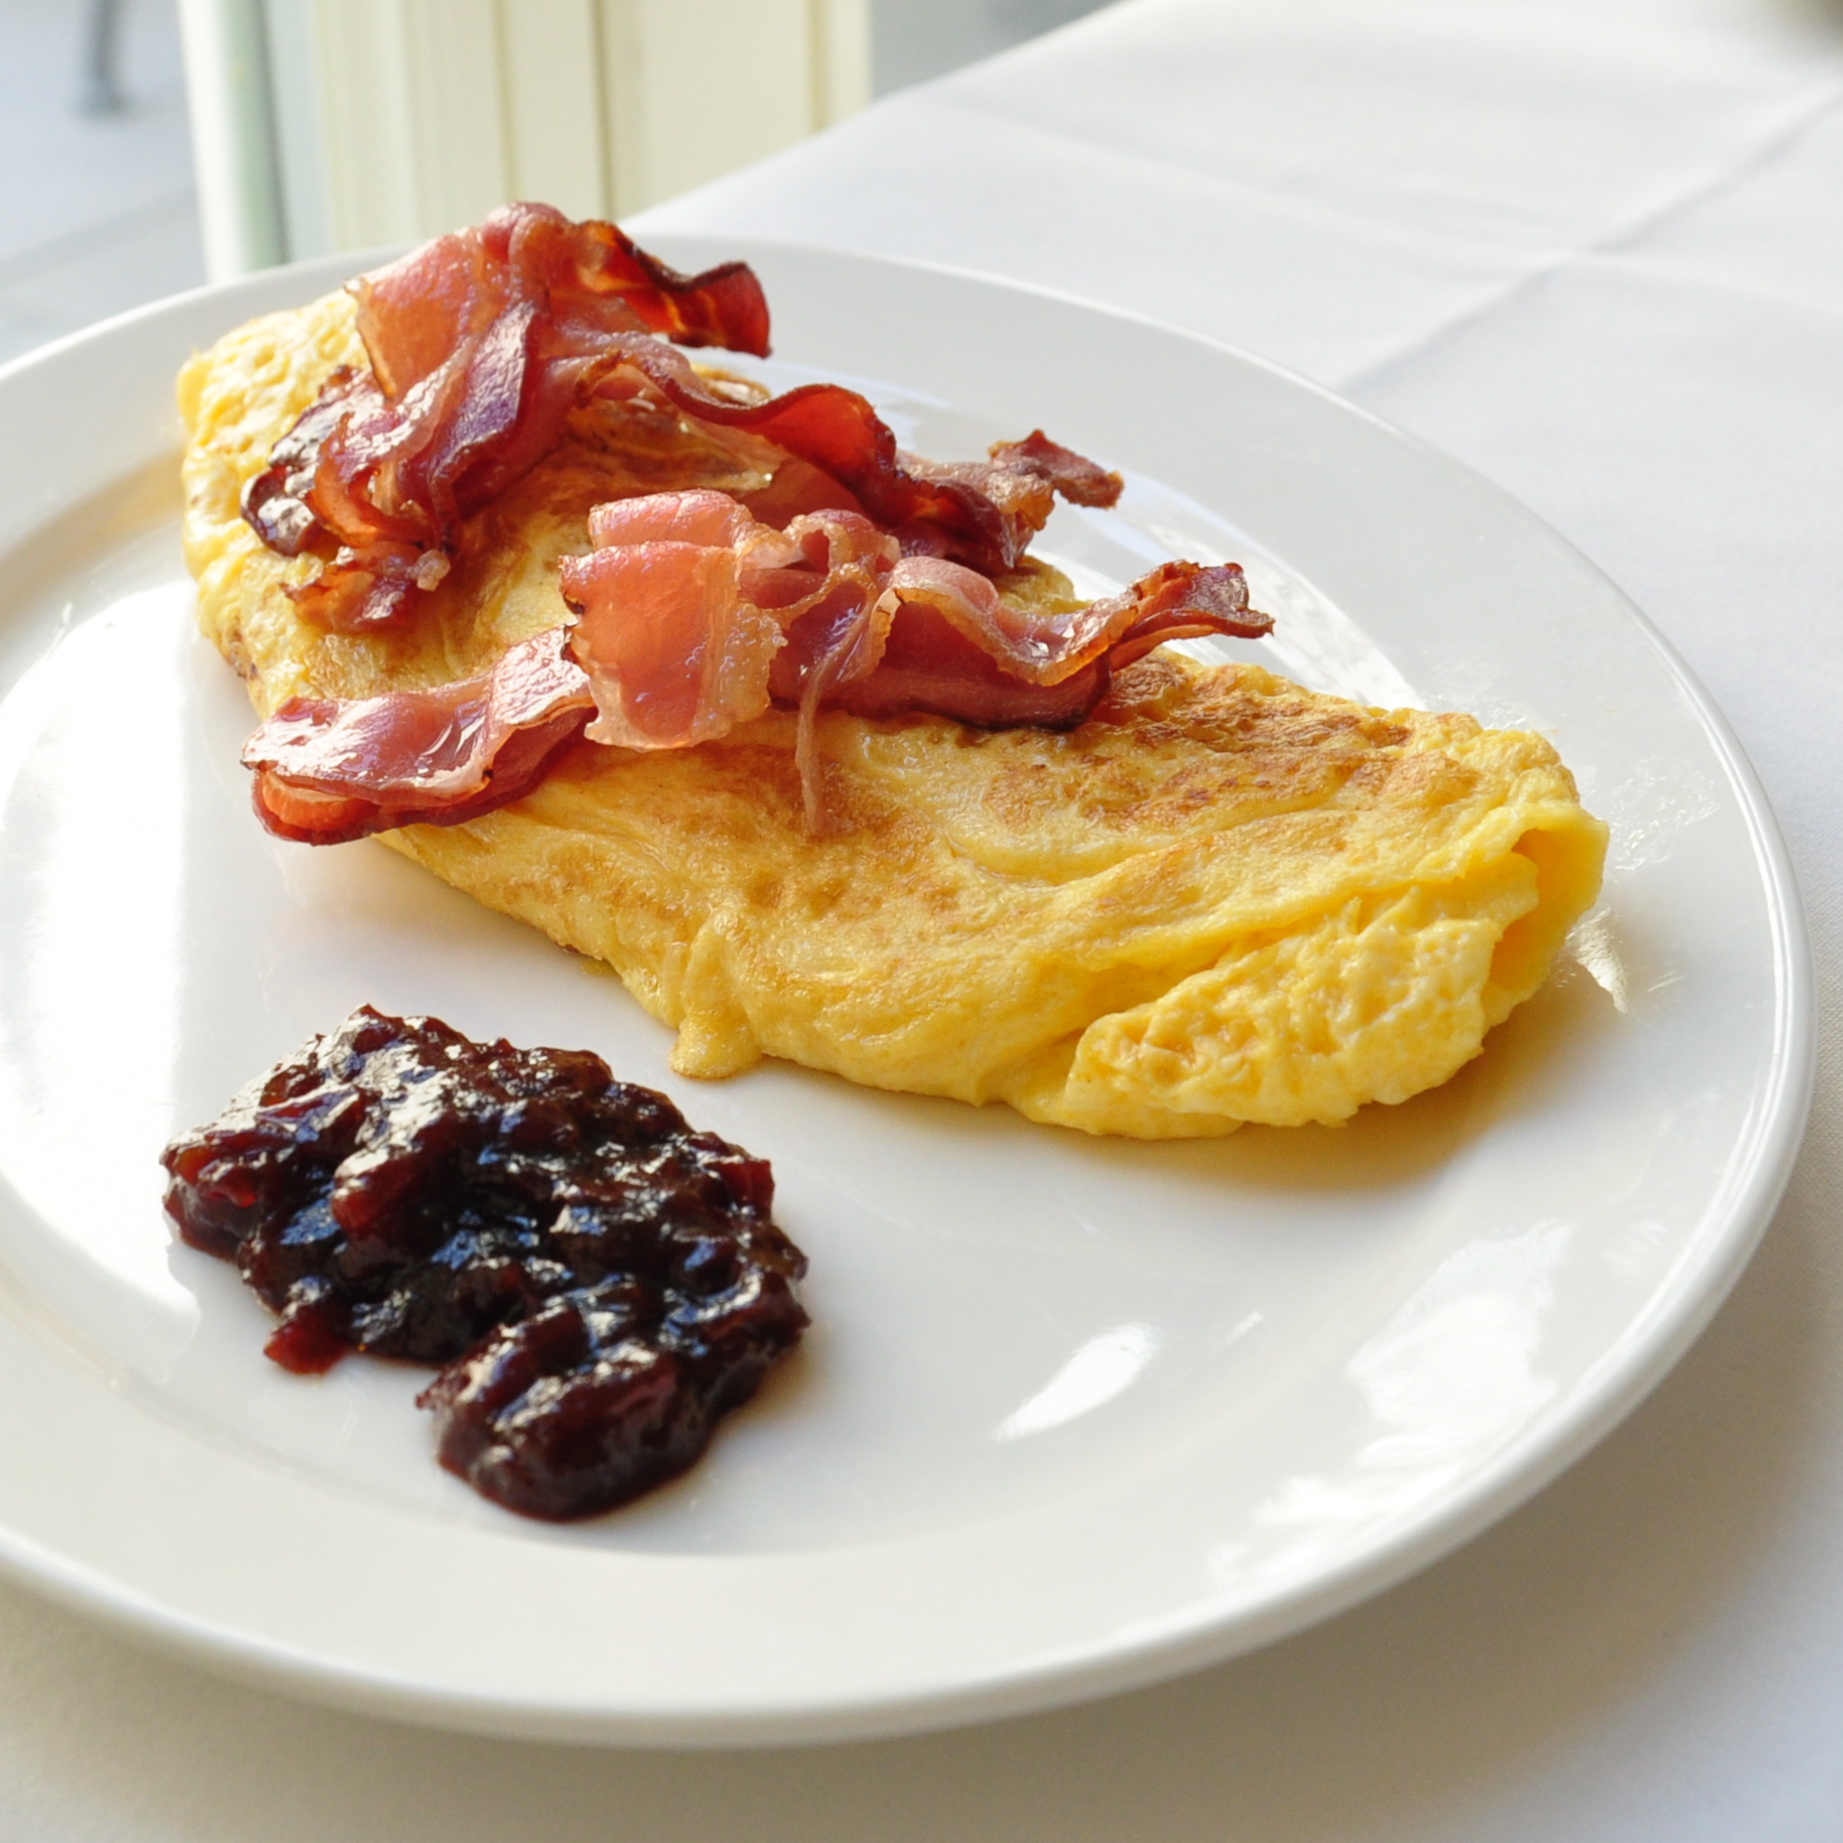 Kaffeehaus-Grosz-Berlin-Fruehstueck-Omlette-Tomatenmarmelade